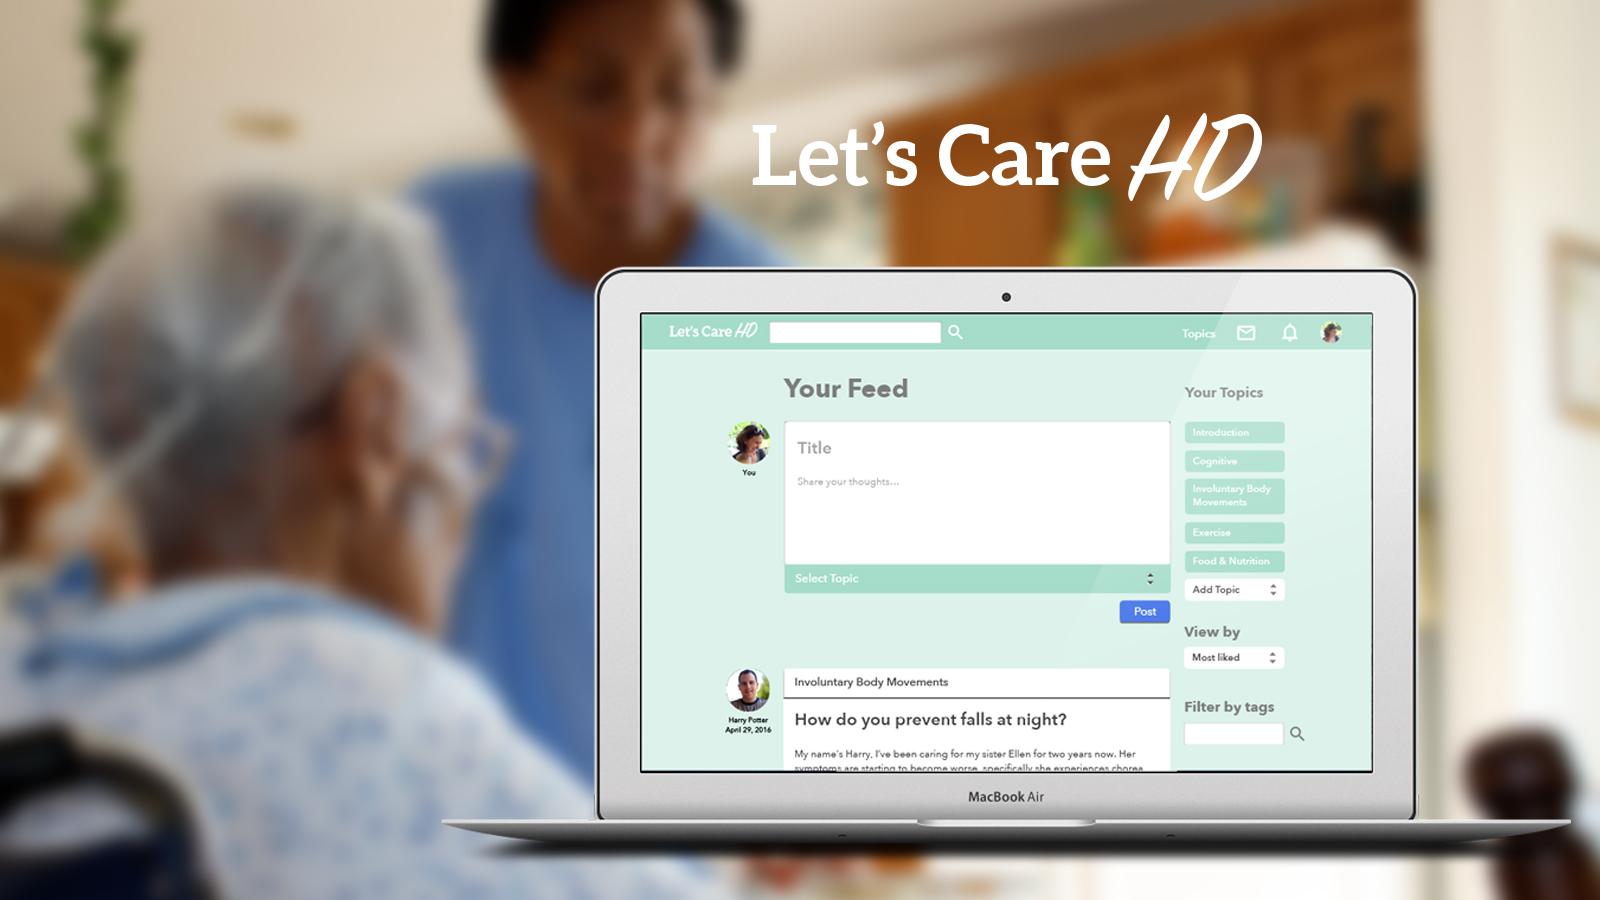 img_lets_care_header_02.jpg